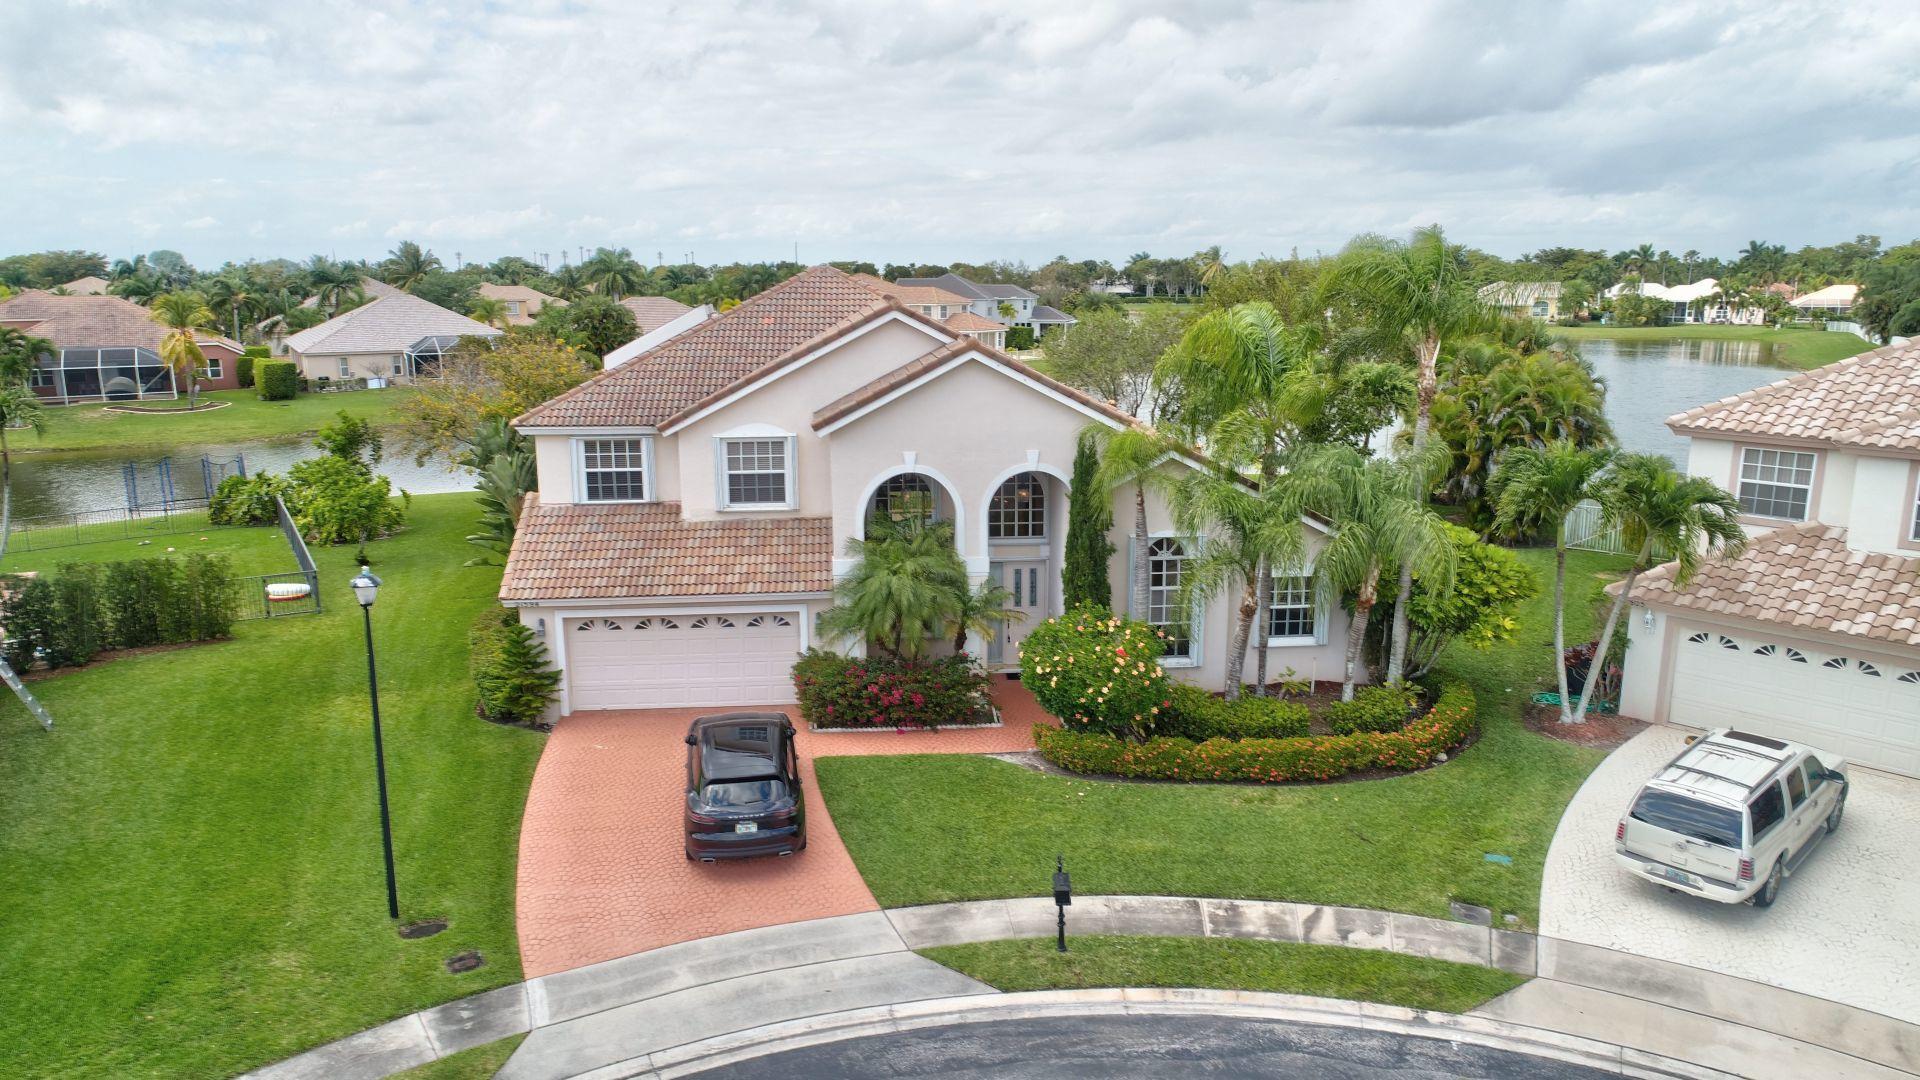 Photo of 21594 Halstead Drive, Boca Raton, FL 33428